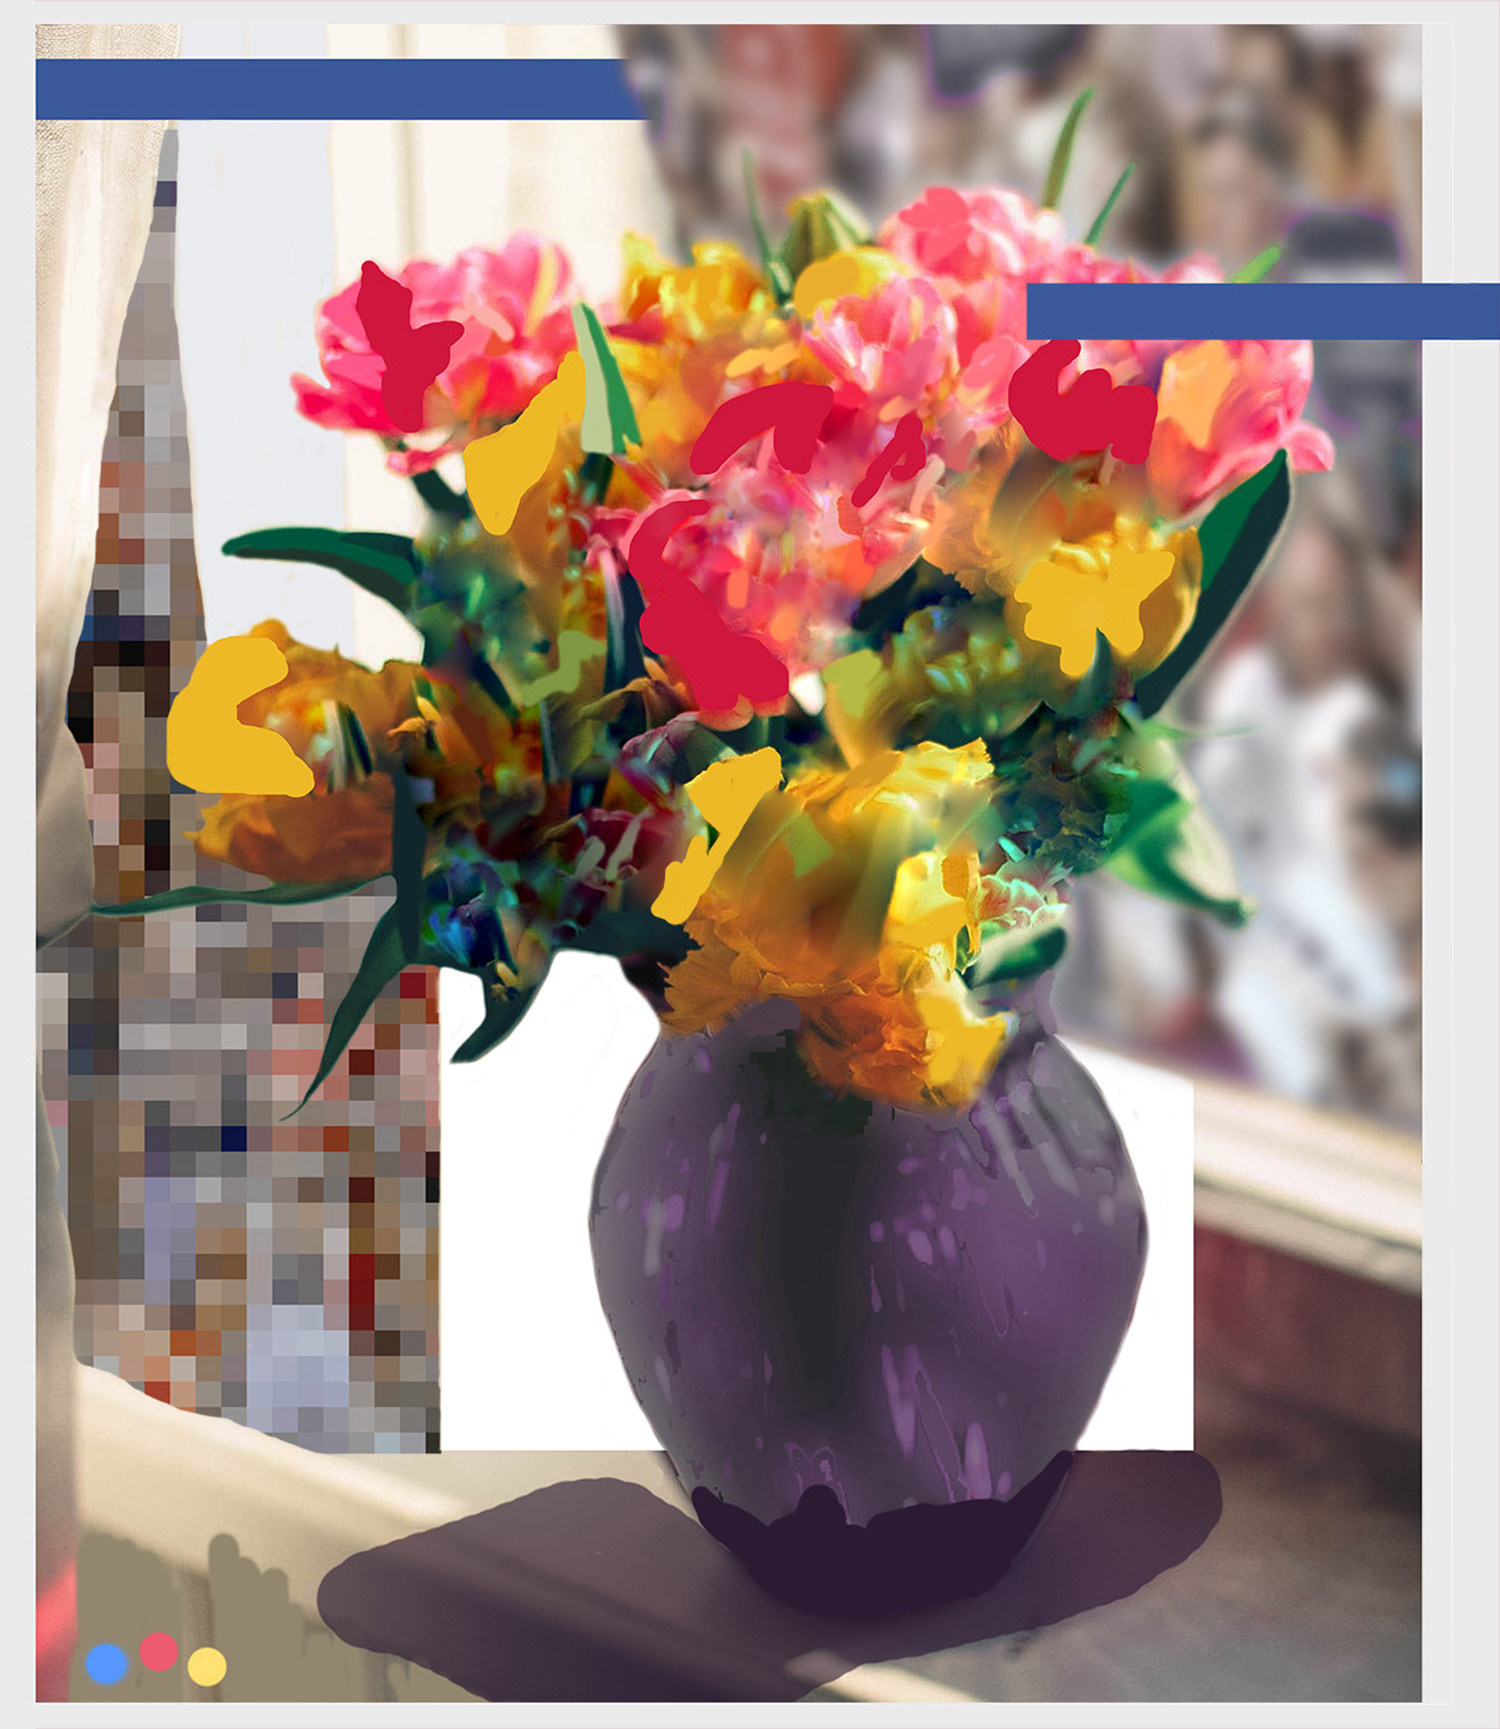 Study After Flowers for Algernon VI (For Facebook) © Gregory Eddi Jones